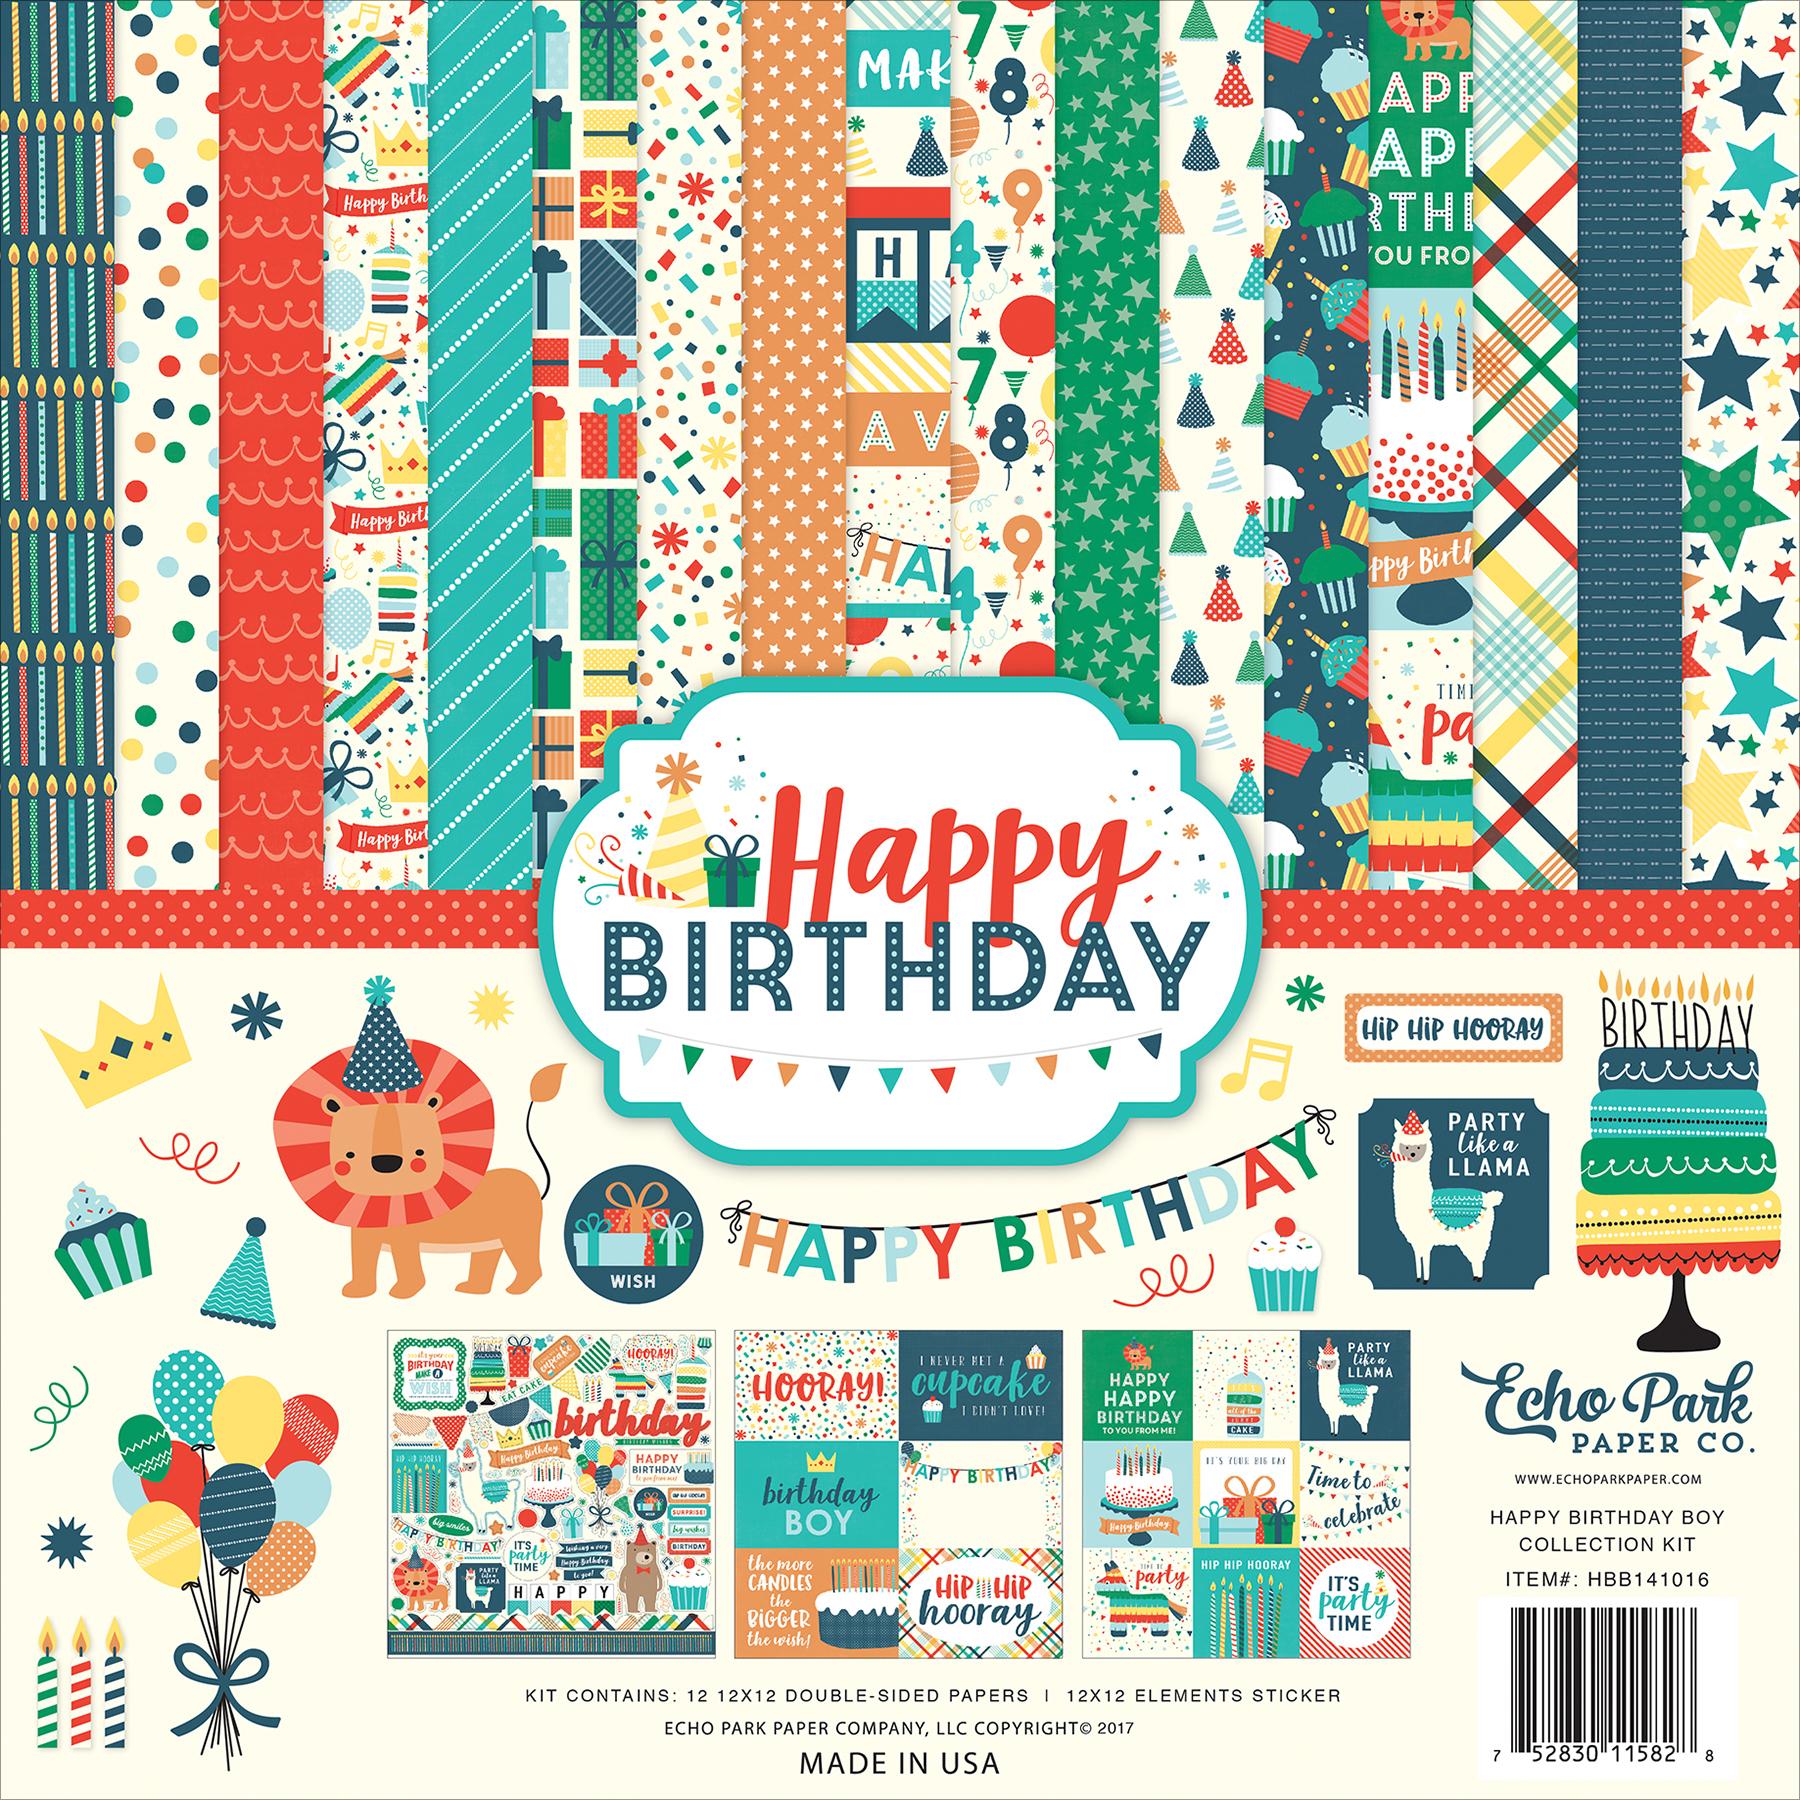 Echo Park Collection Kit 12X12-Happy Birthday Boy